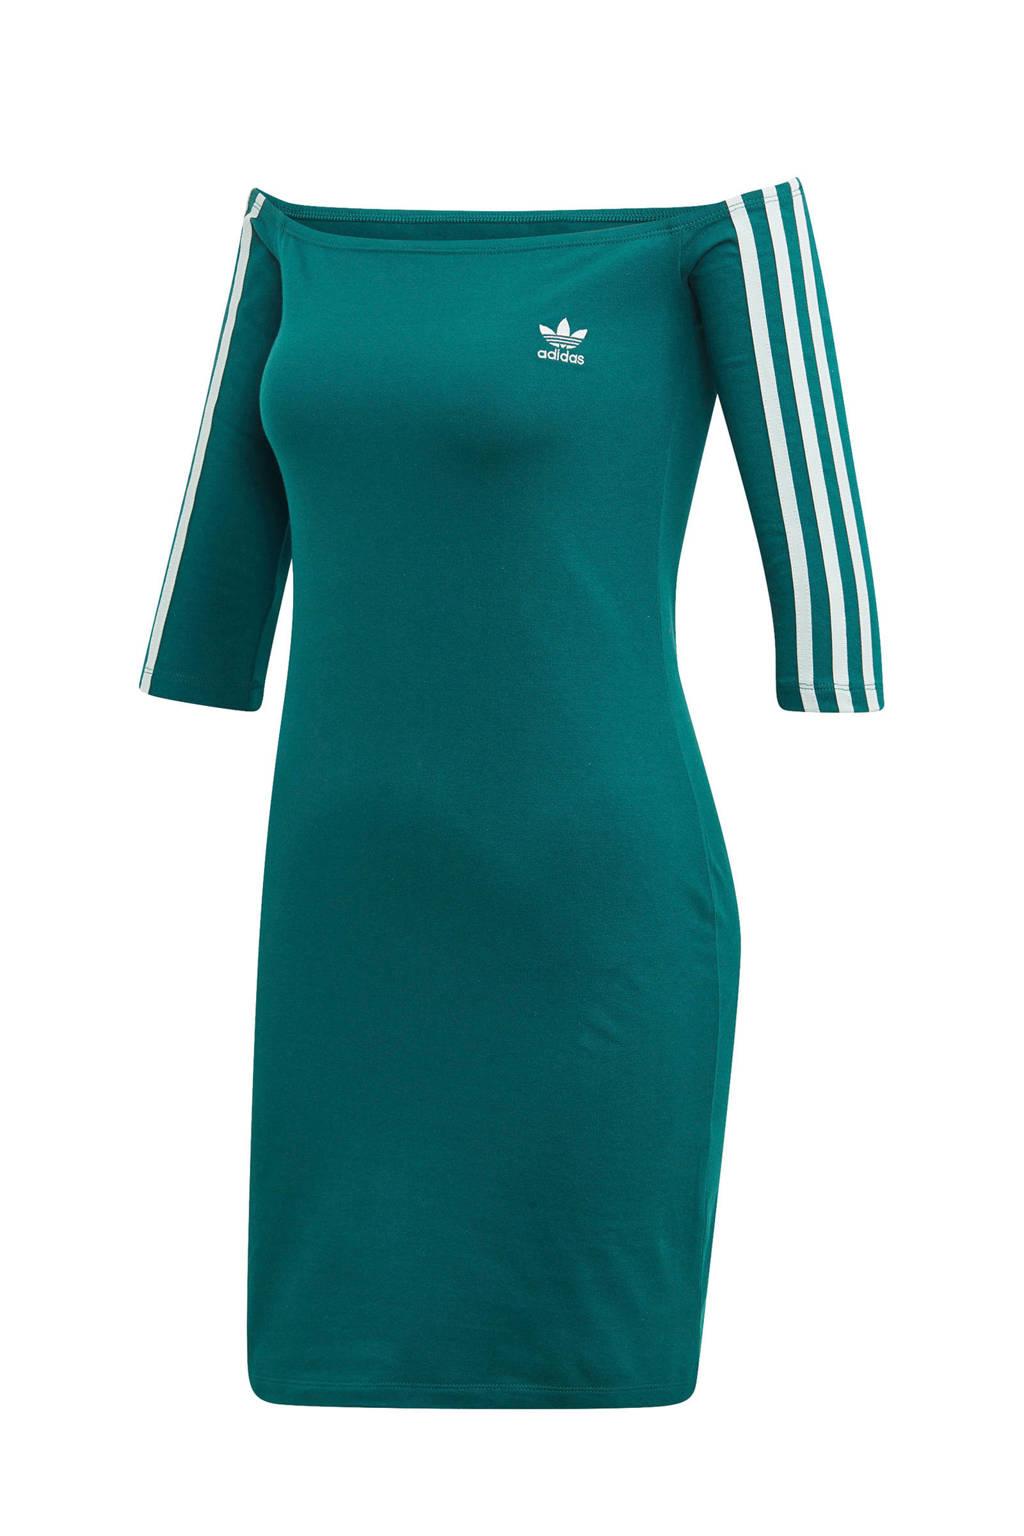 adidas originals off shoulder jurk groen/wit, Groen/wit